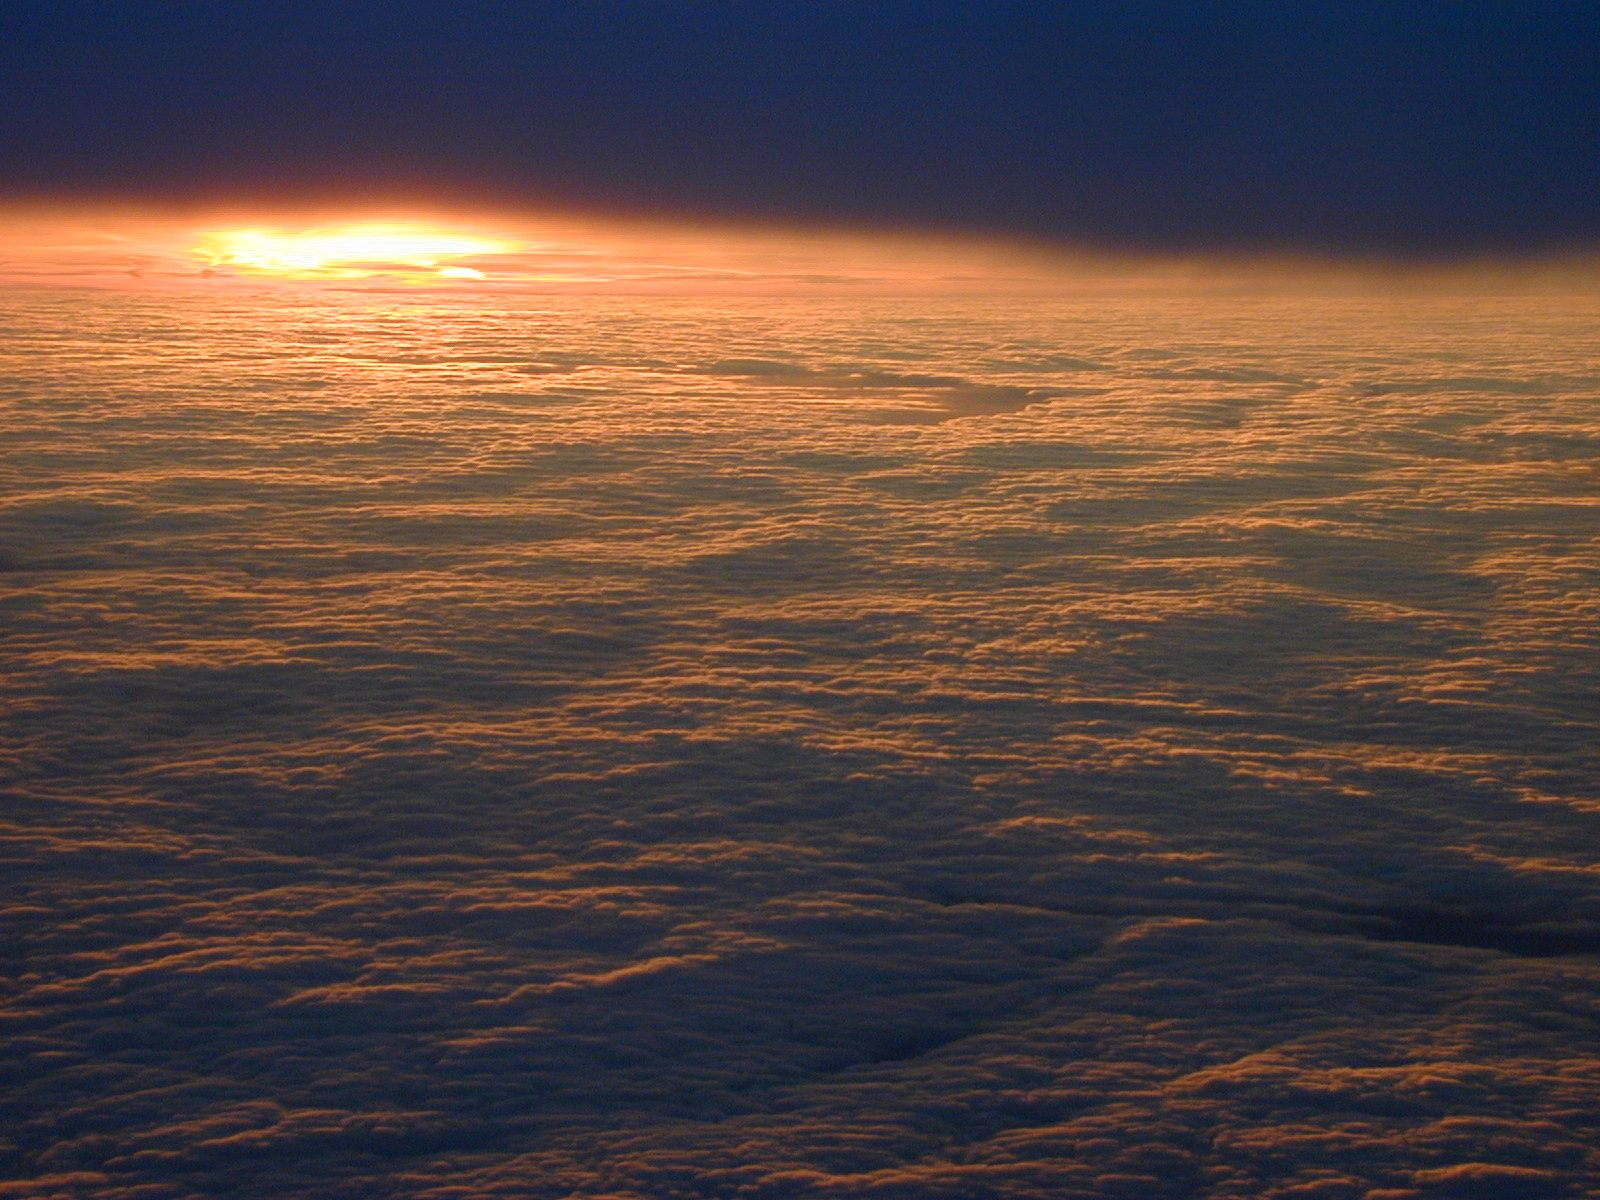 sunset nuclear-blast nuclear blast sun clouds above aeroplane flying